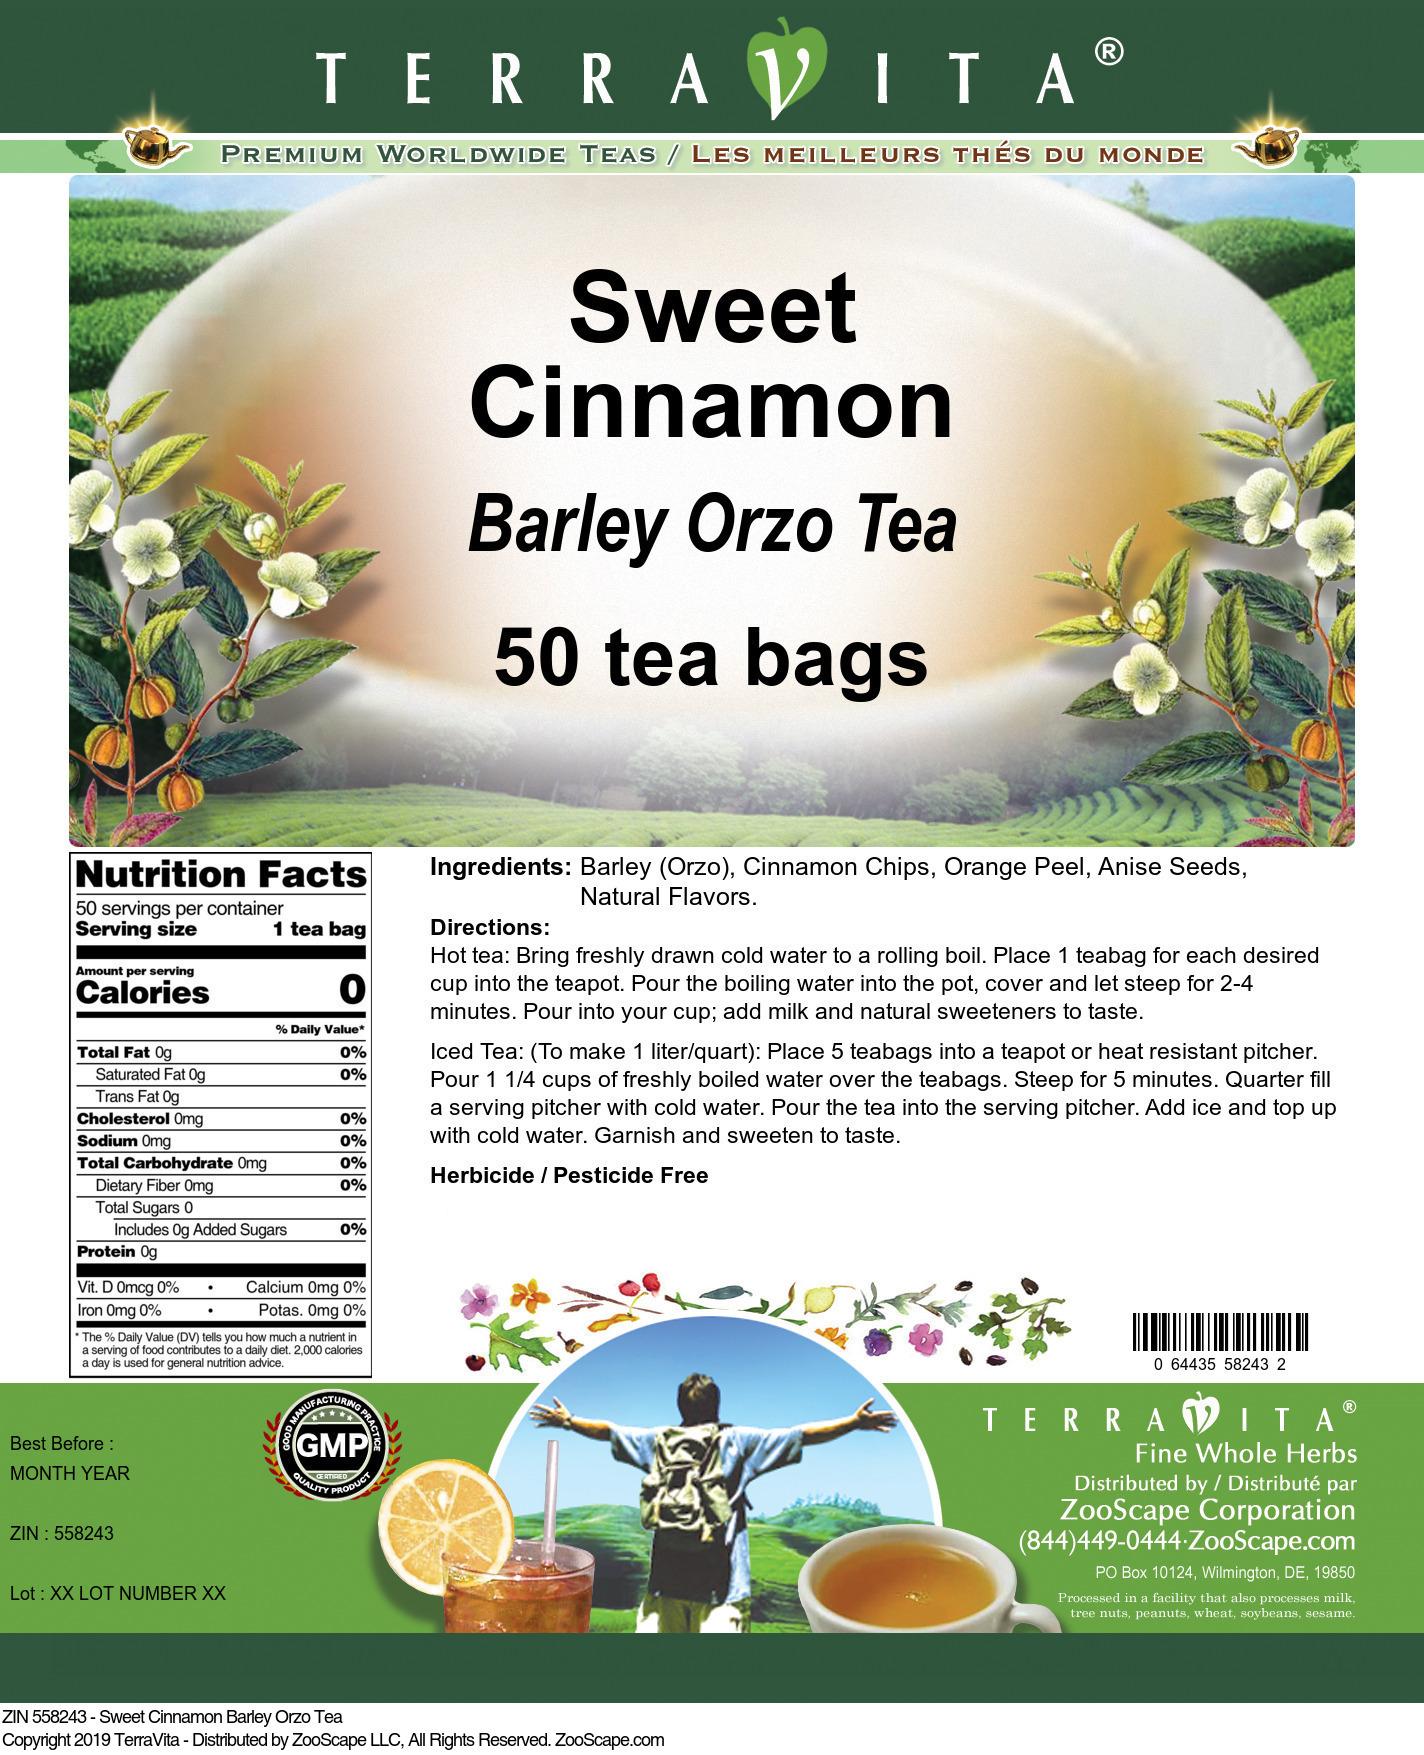 Sweet Cinnamon Barley Orzo